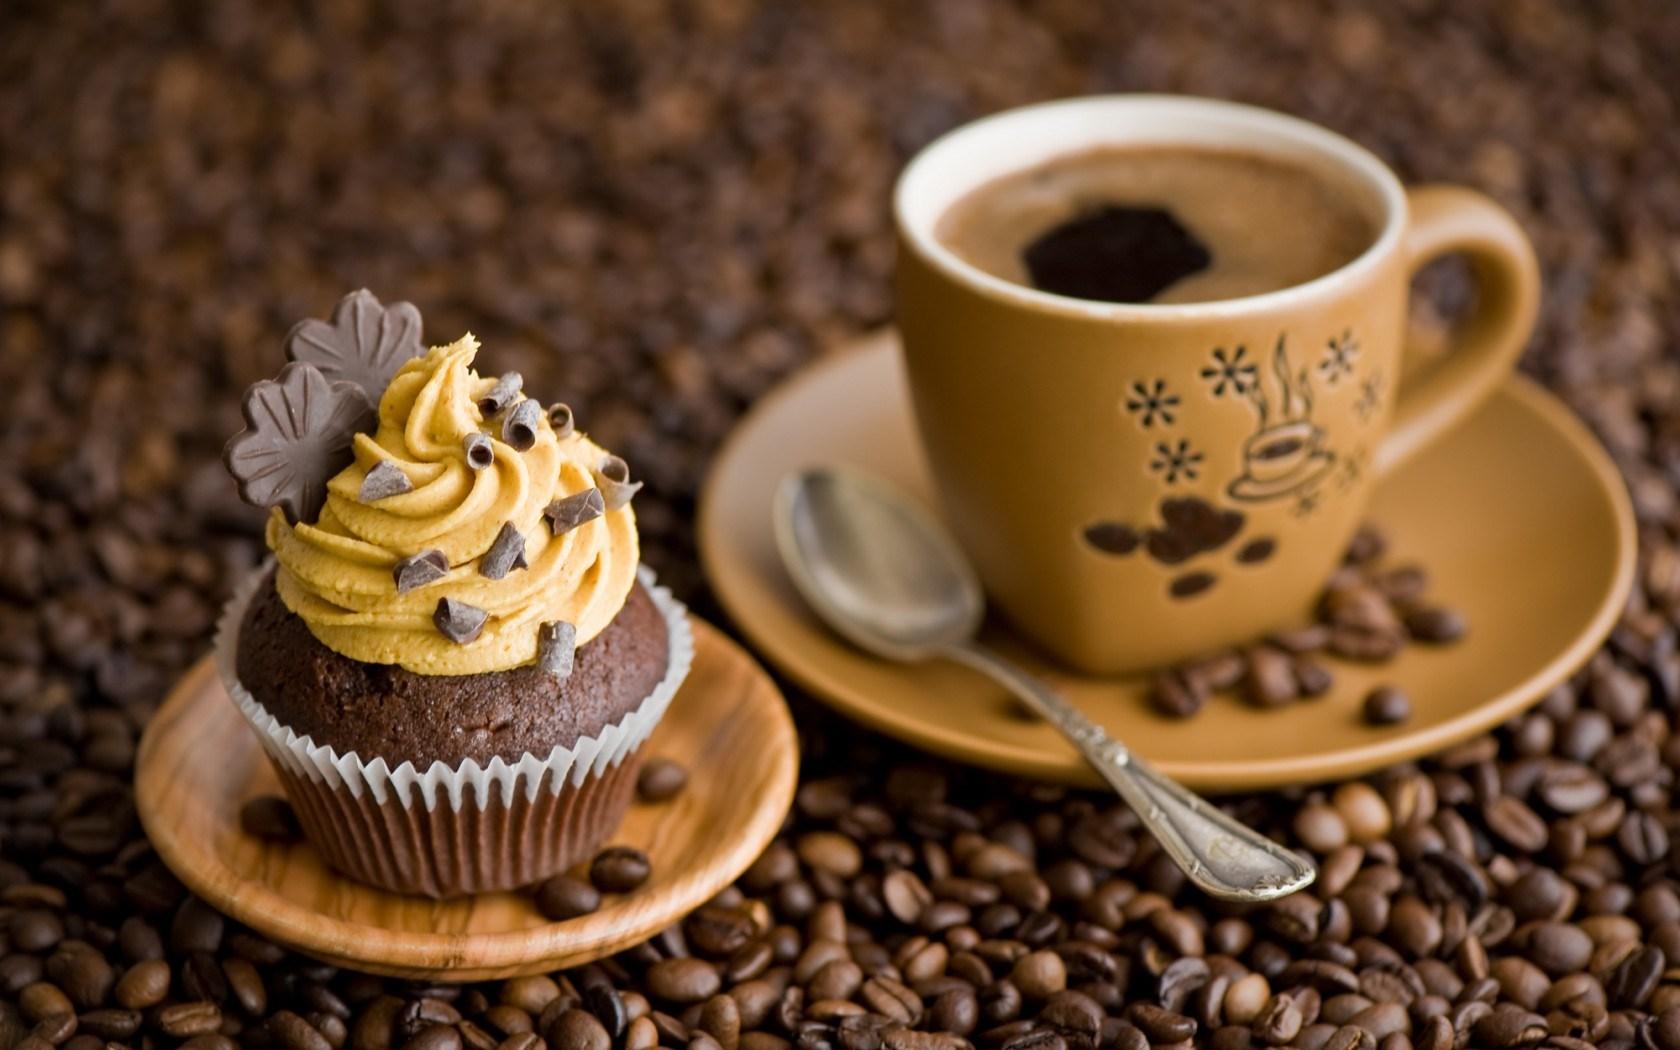 Cake Cream Chocolate Cup Coffee